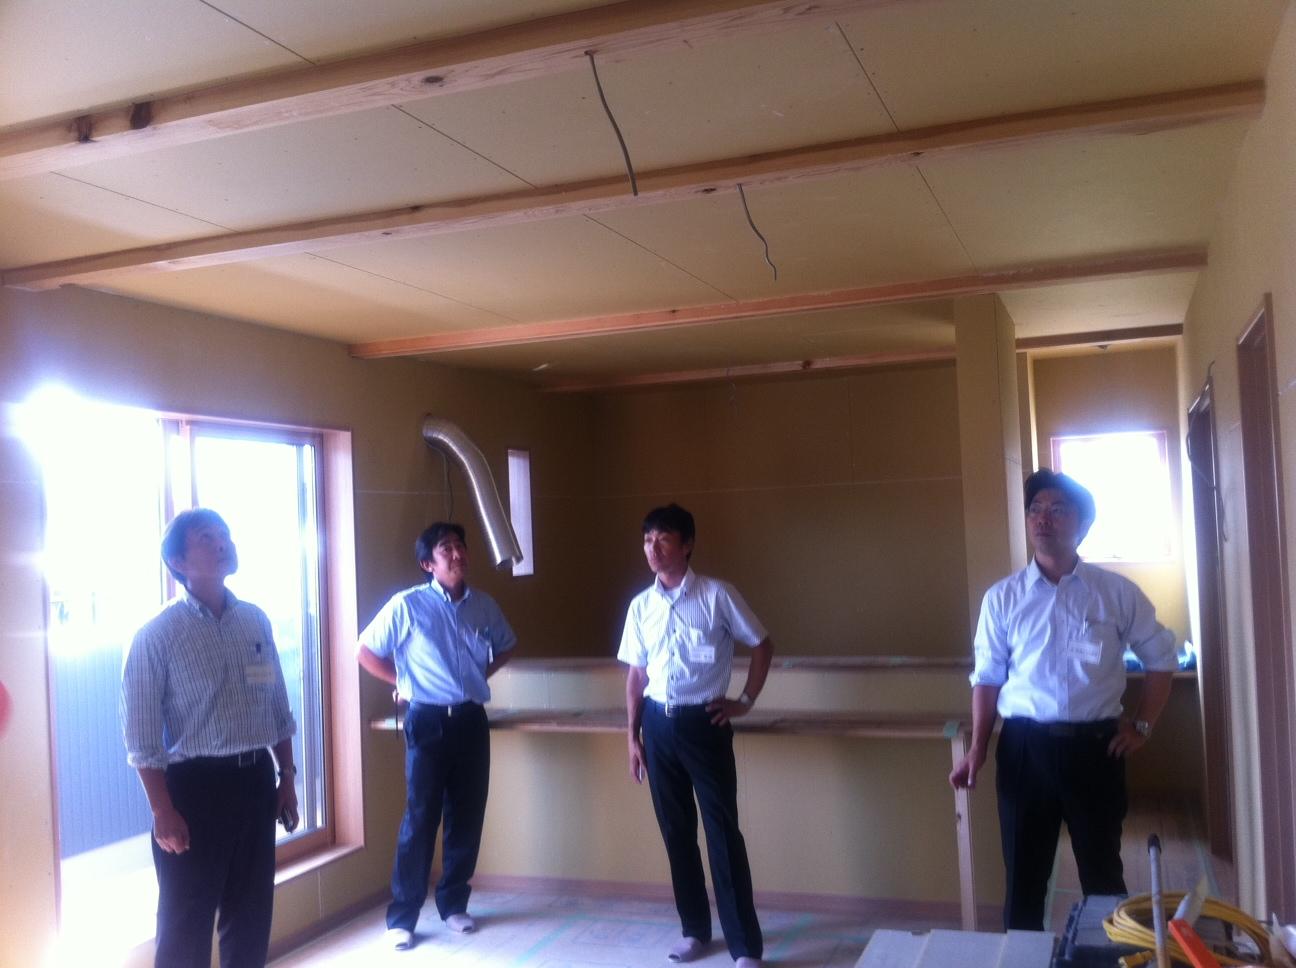 Last懇話会@浜松_e0149215_8442778.jpg